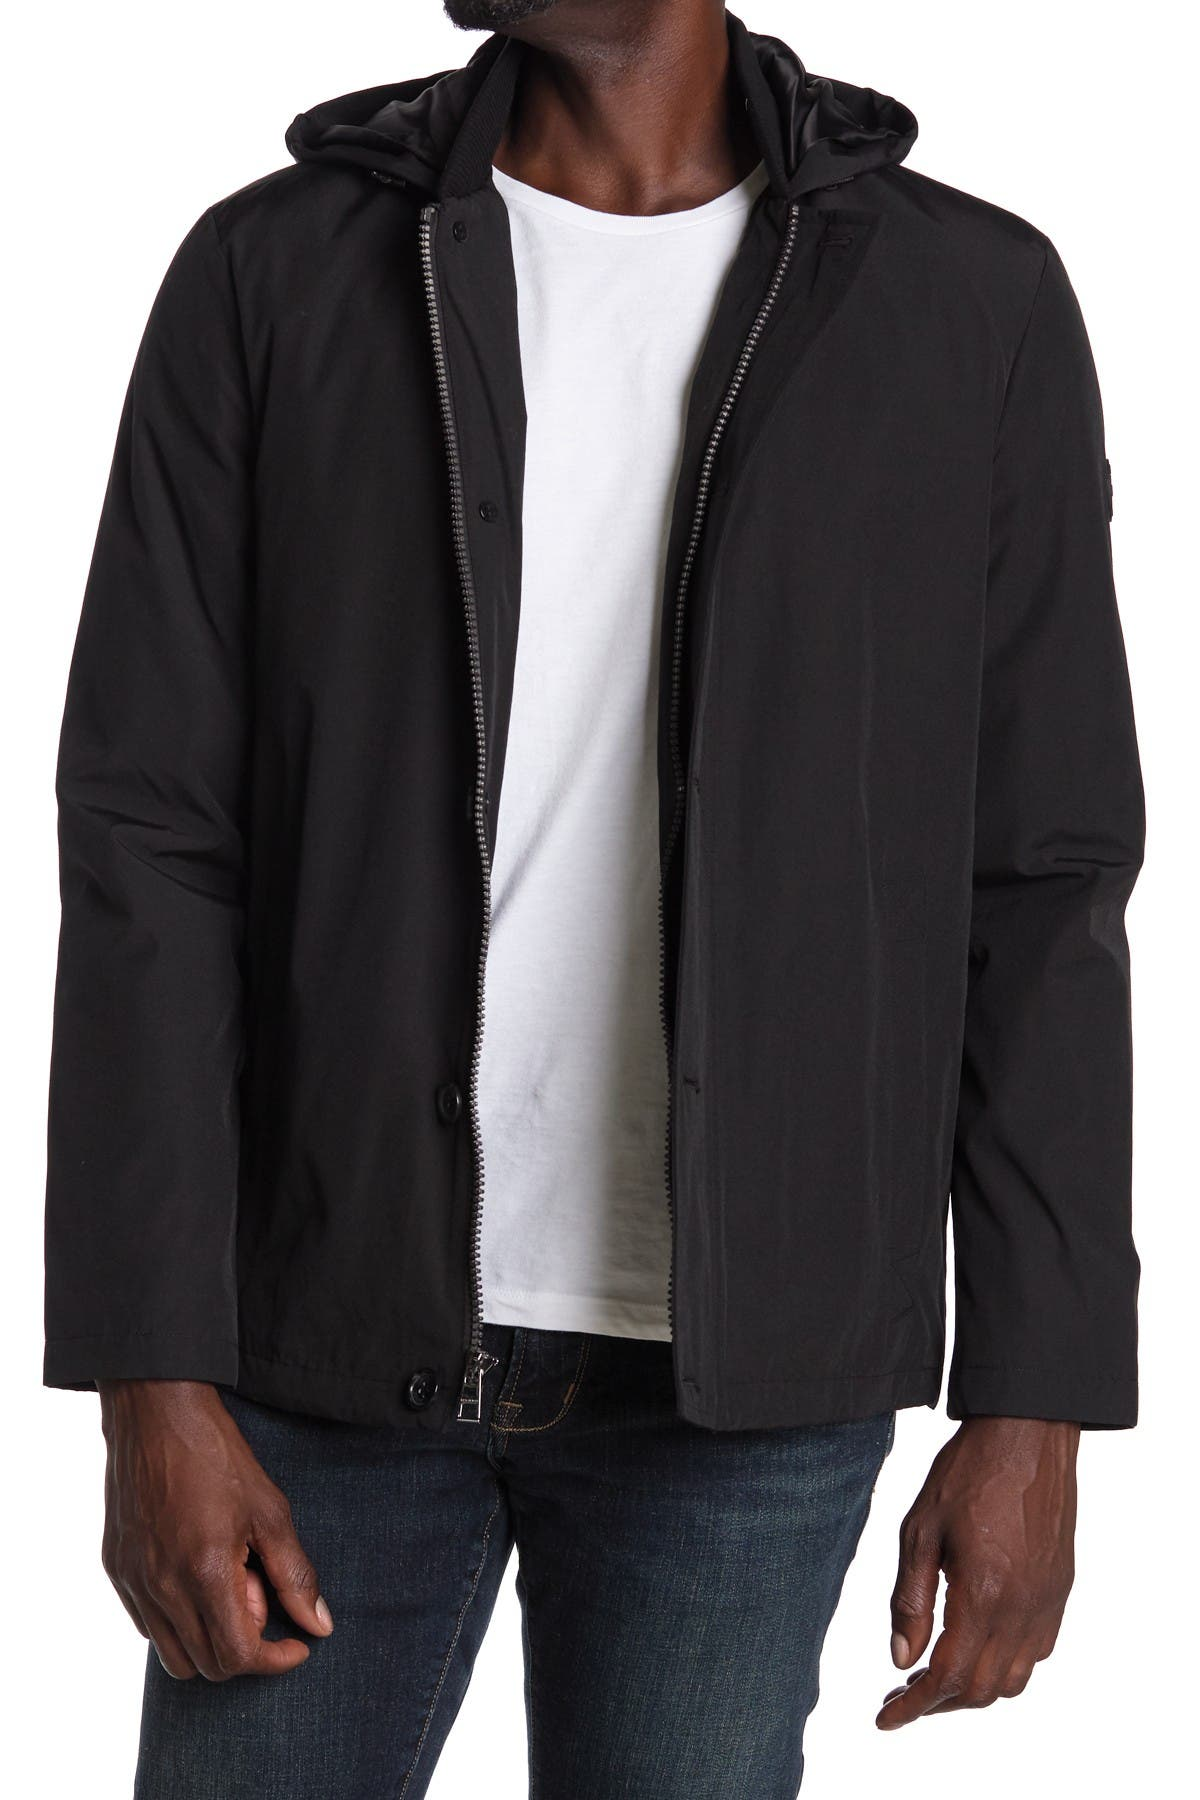 Image of Michael Kors Hooded Zip Front Jacket